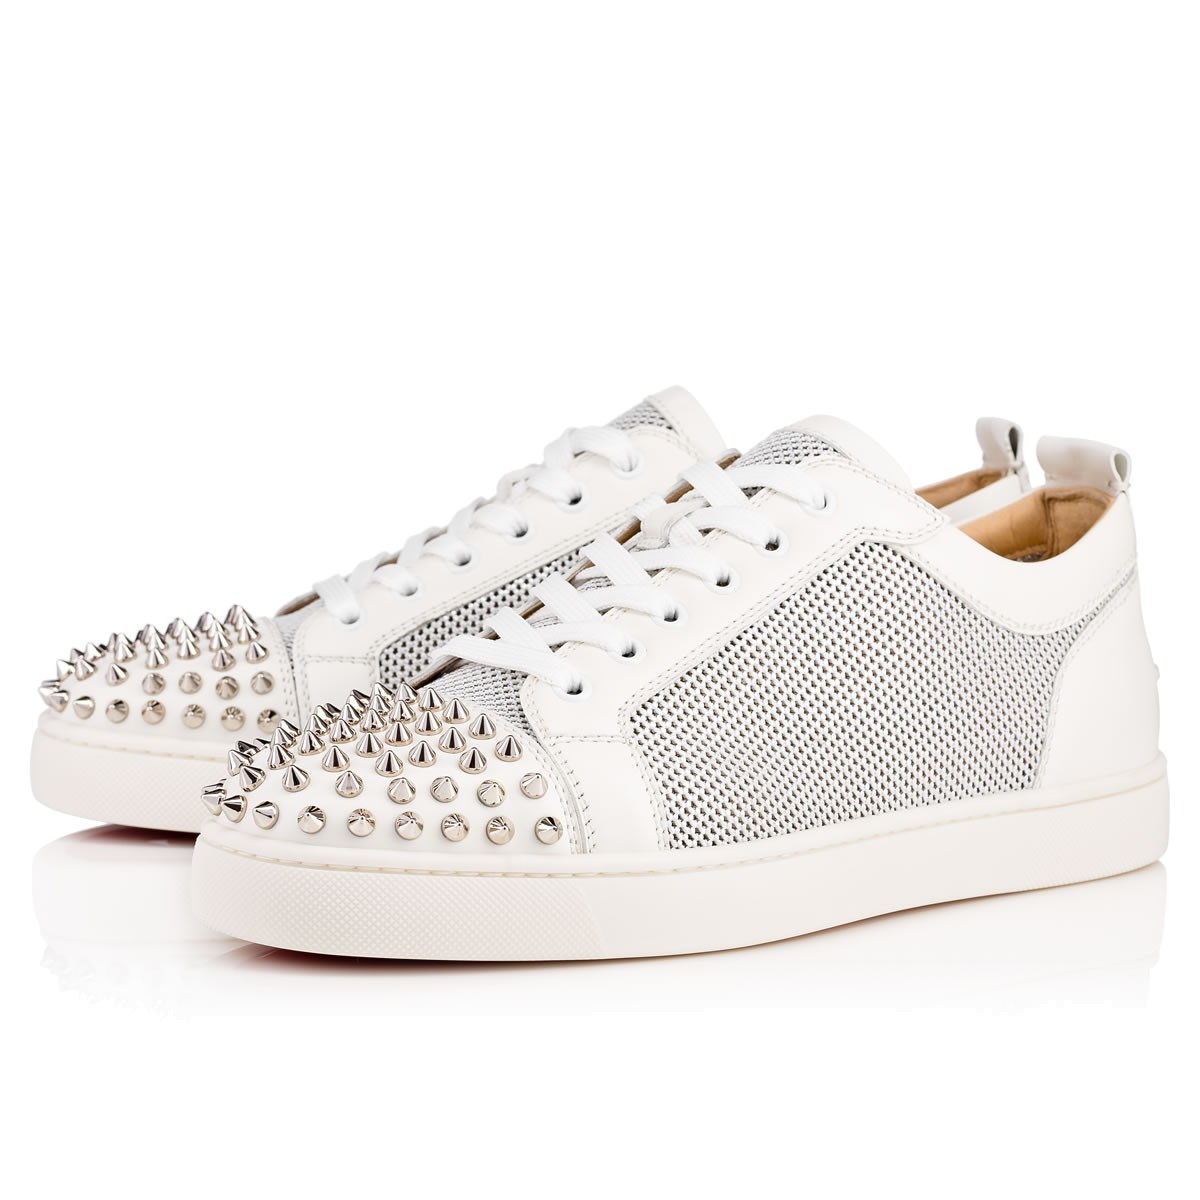 1614b4d606f Ac Louis Junior Spikes Flat Version Silver Leather - Men Shoes - Christian  Louboutin